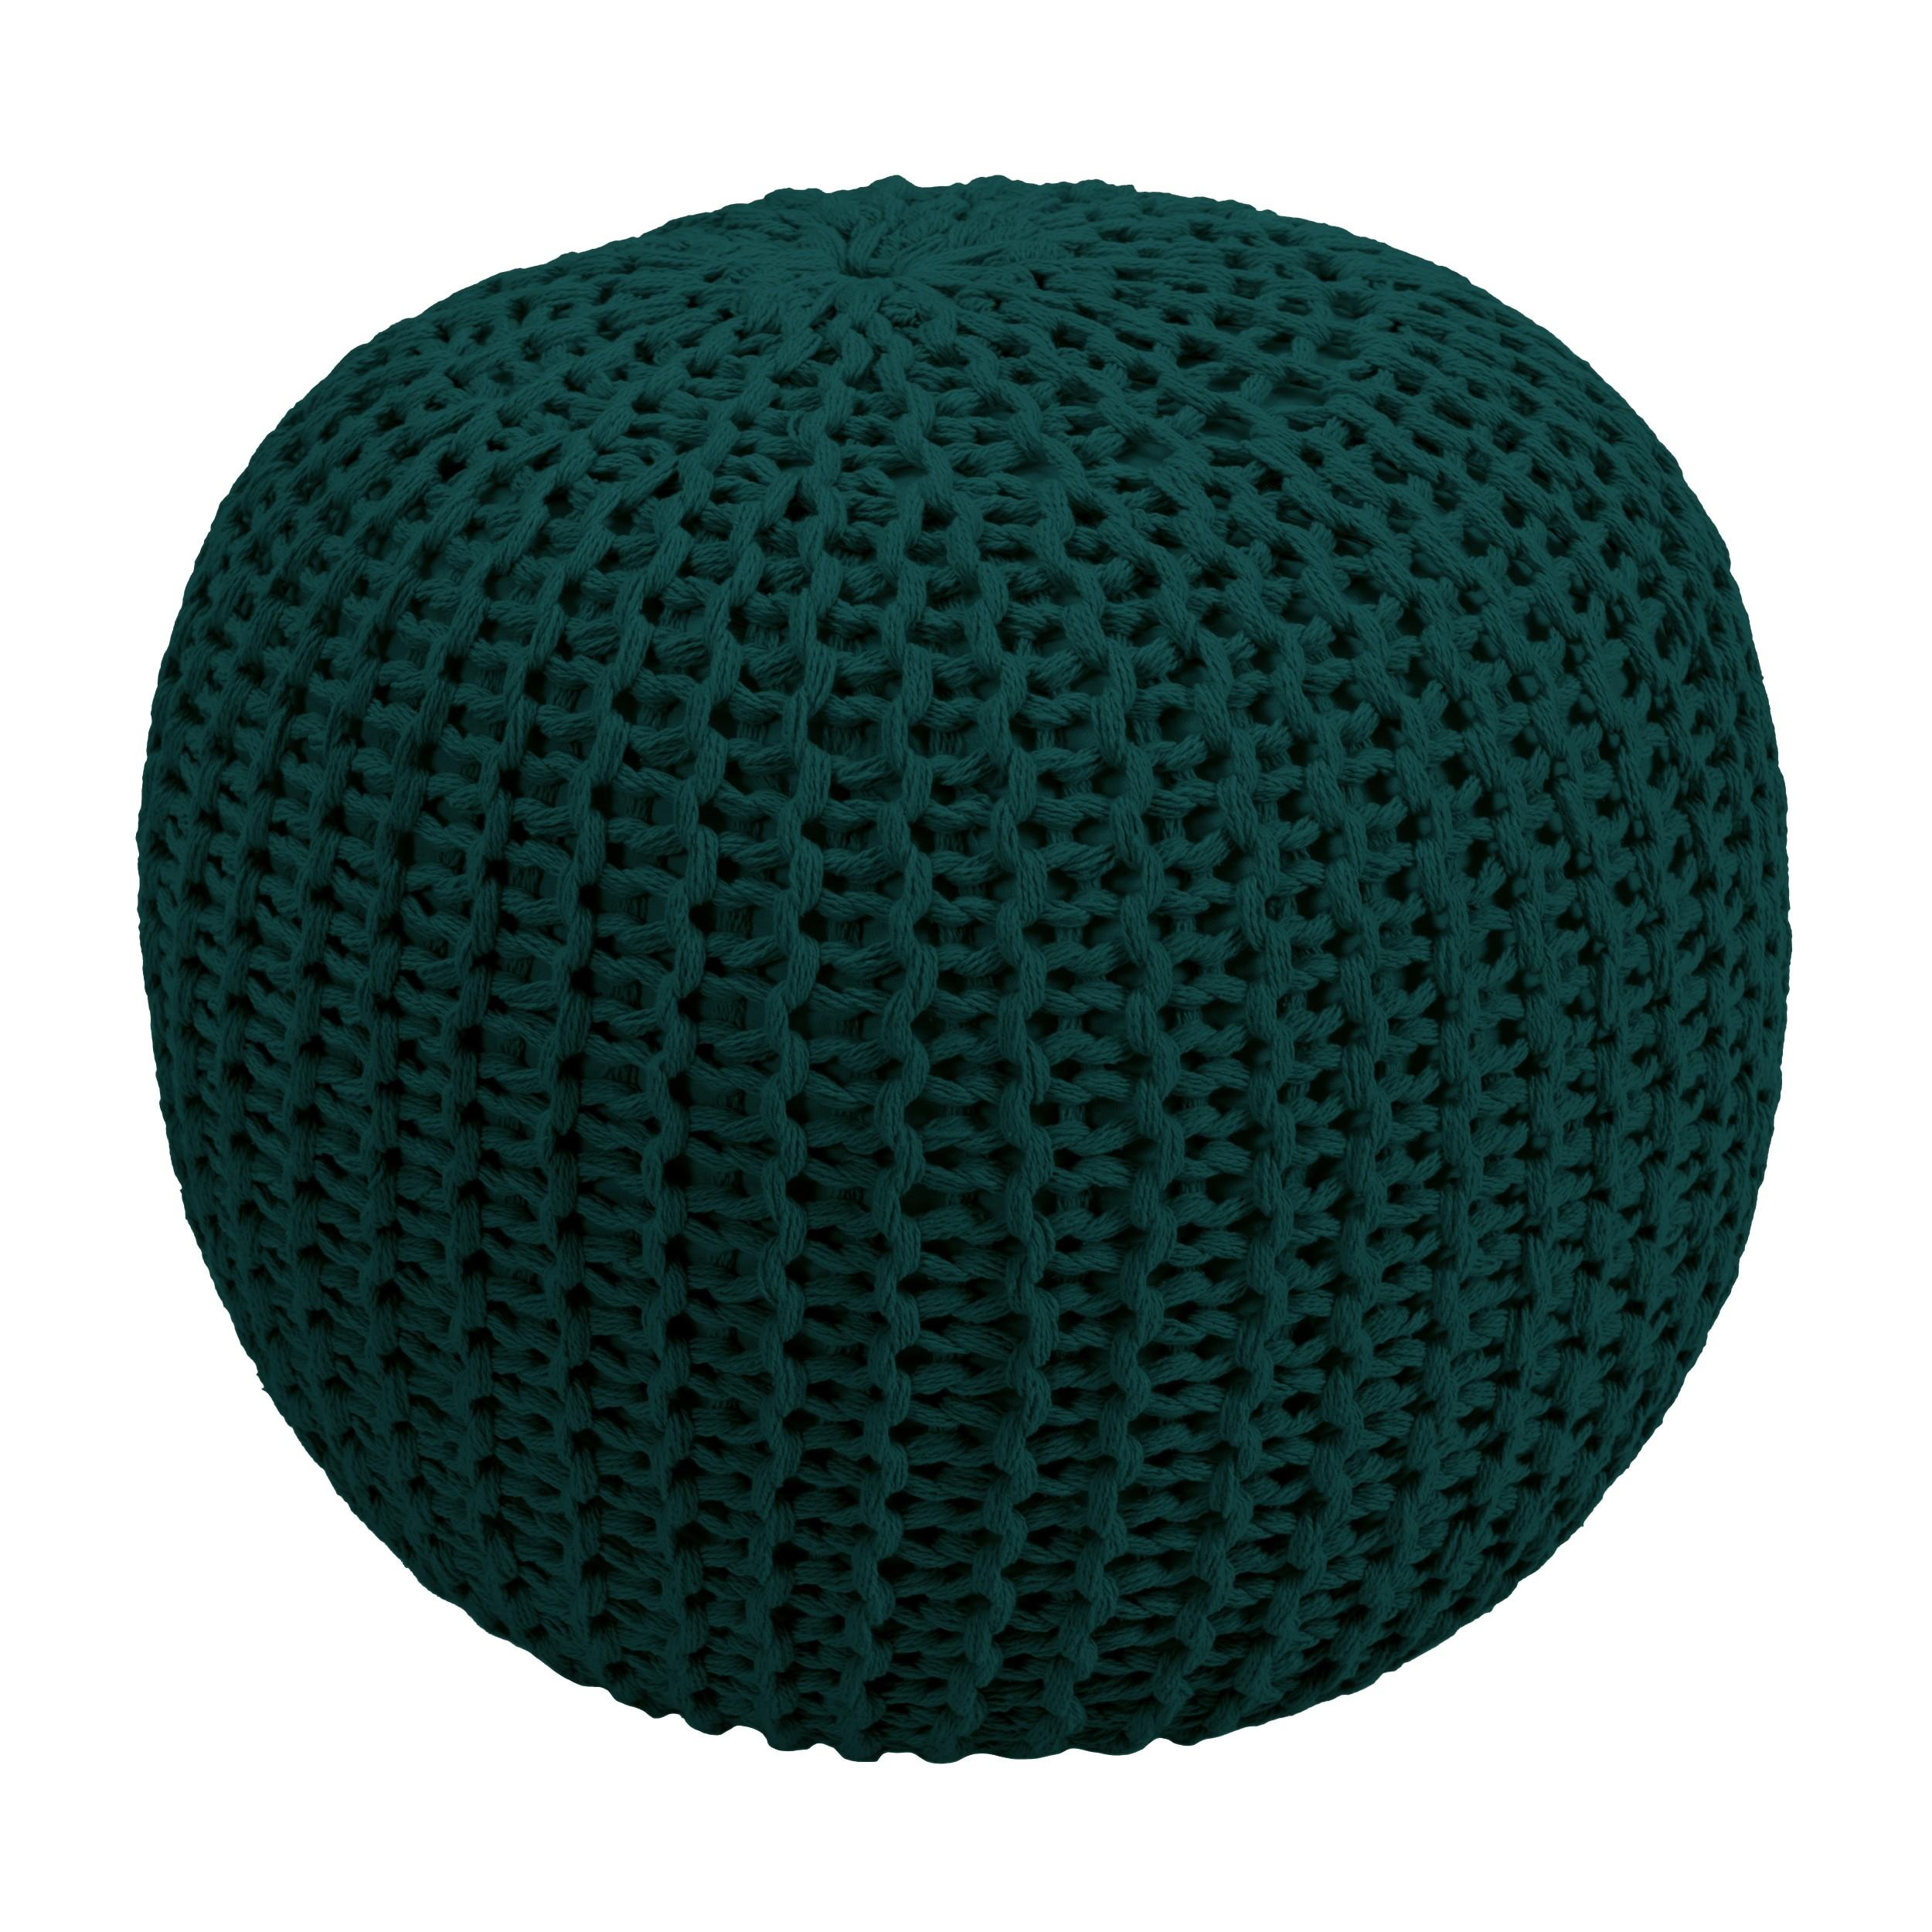 Cache Pied De Sapin Rotin pouf tricot vert sapin elisa ∅ 40cm